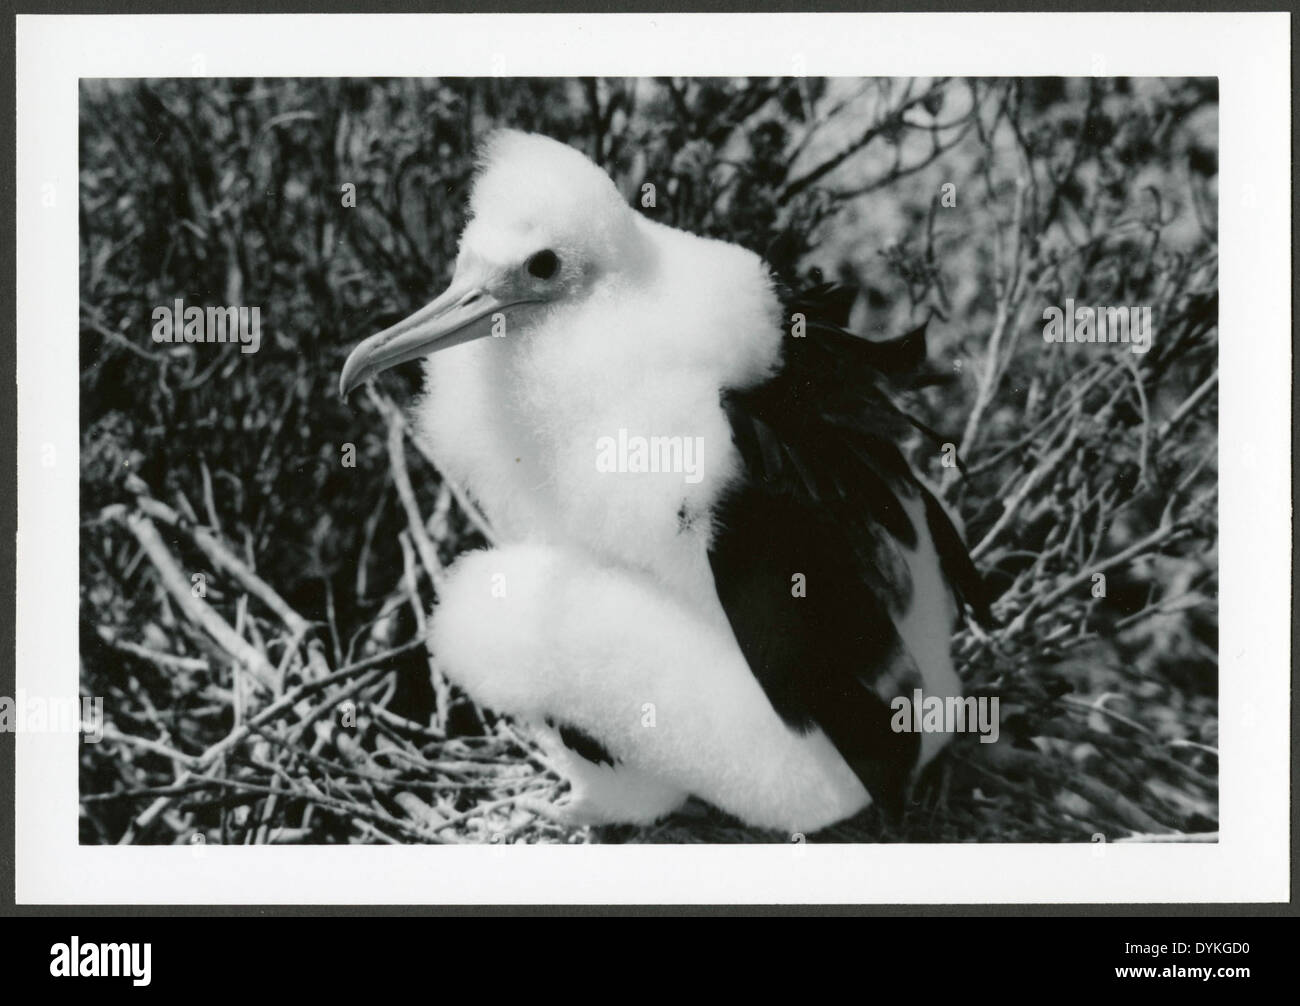 Fregata minor [Great Frigatebird] 50 days old, on Christmas Island [Kiritimati], Kiribati, 1967. - Stock Image